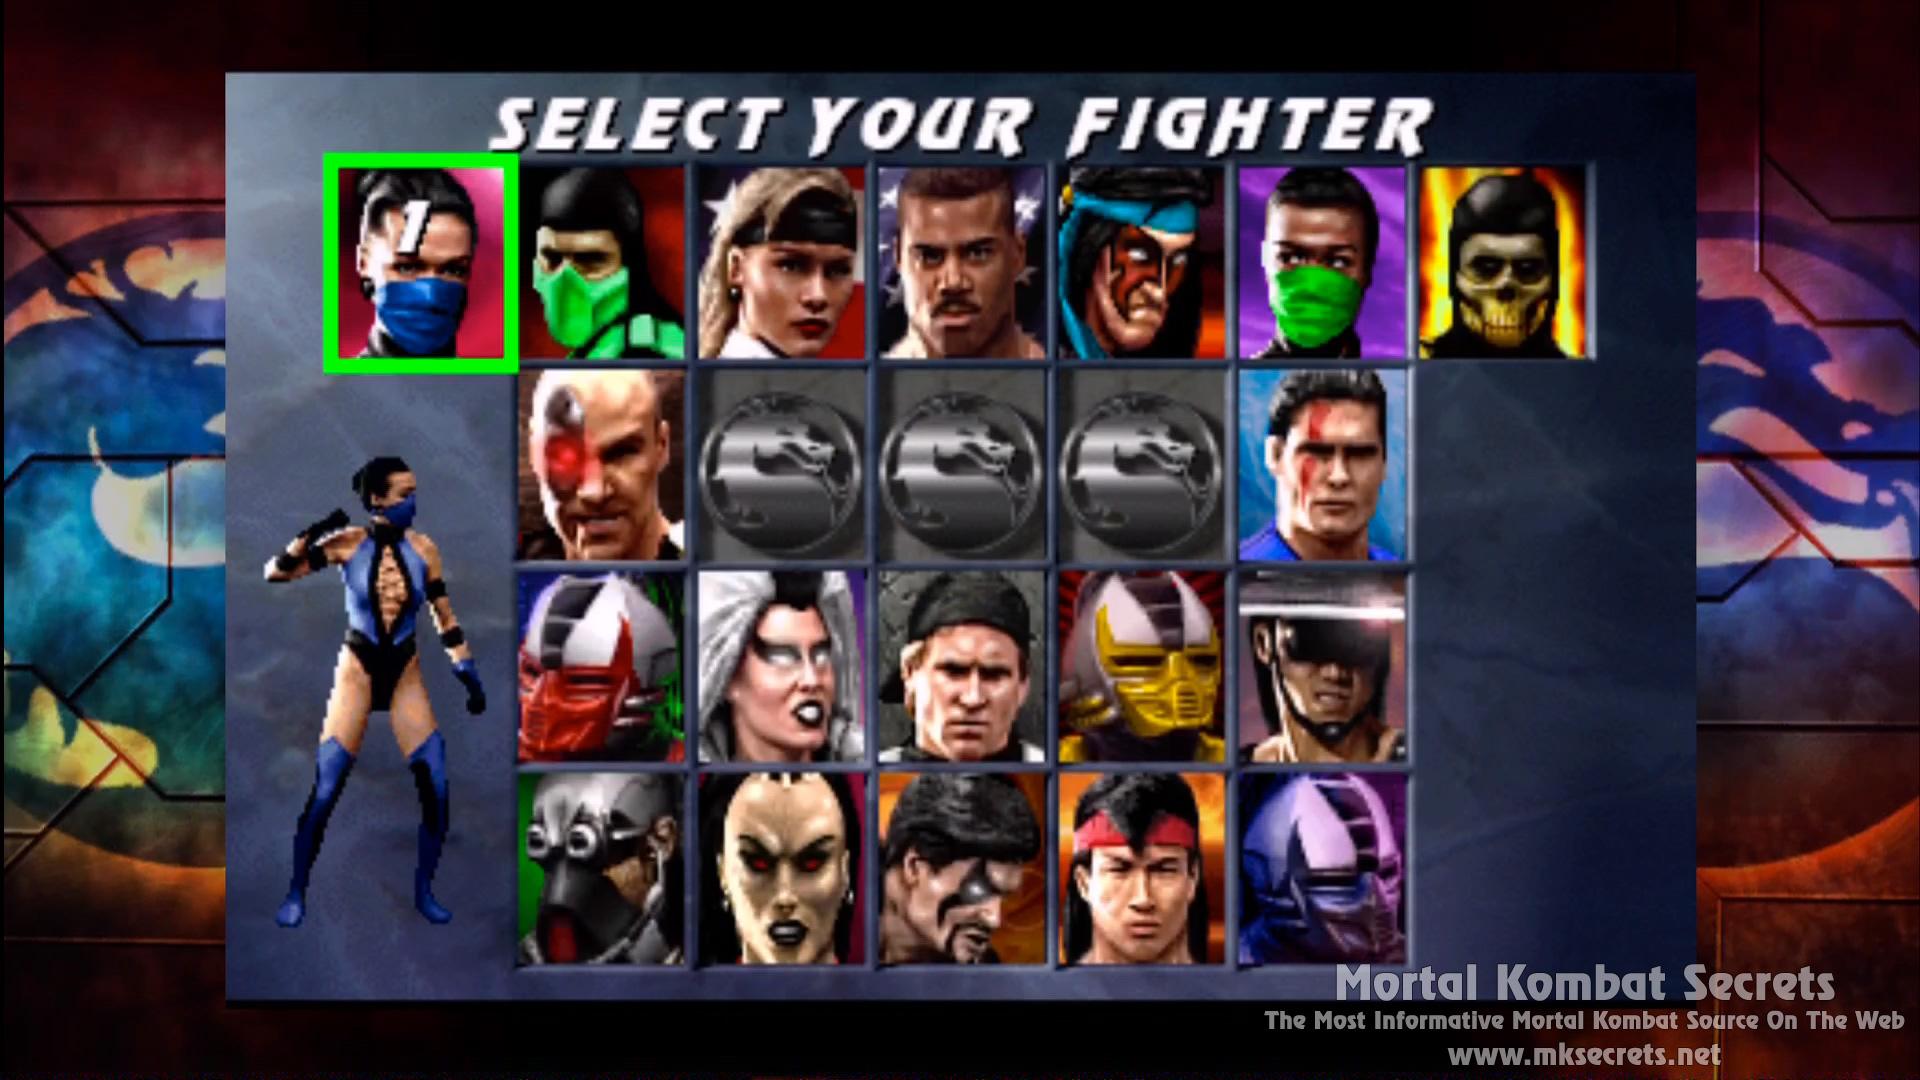 Mortal Kombat Xbox 360 Cheats Unlock Characters